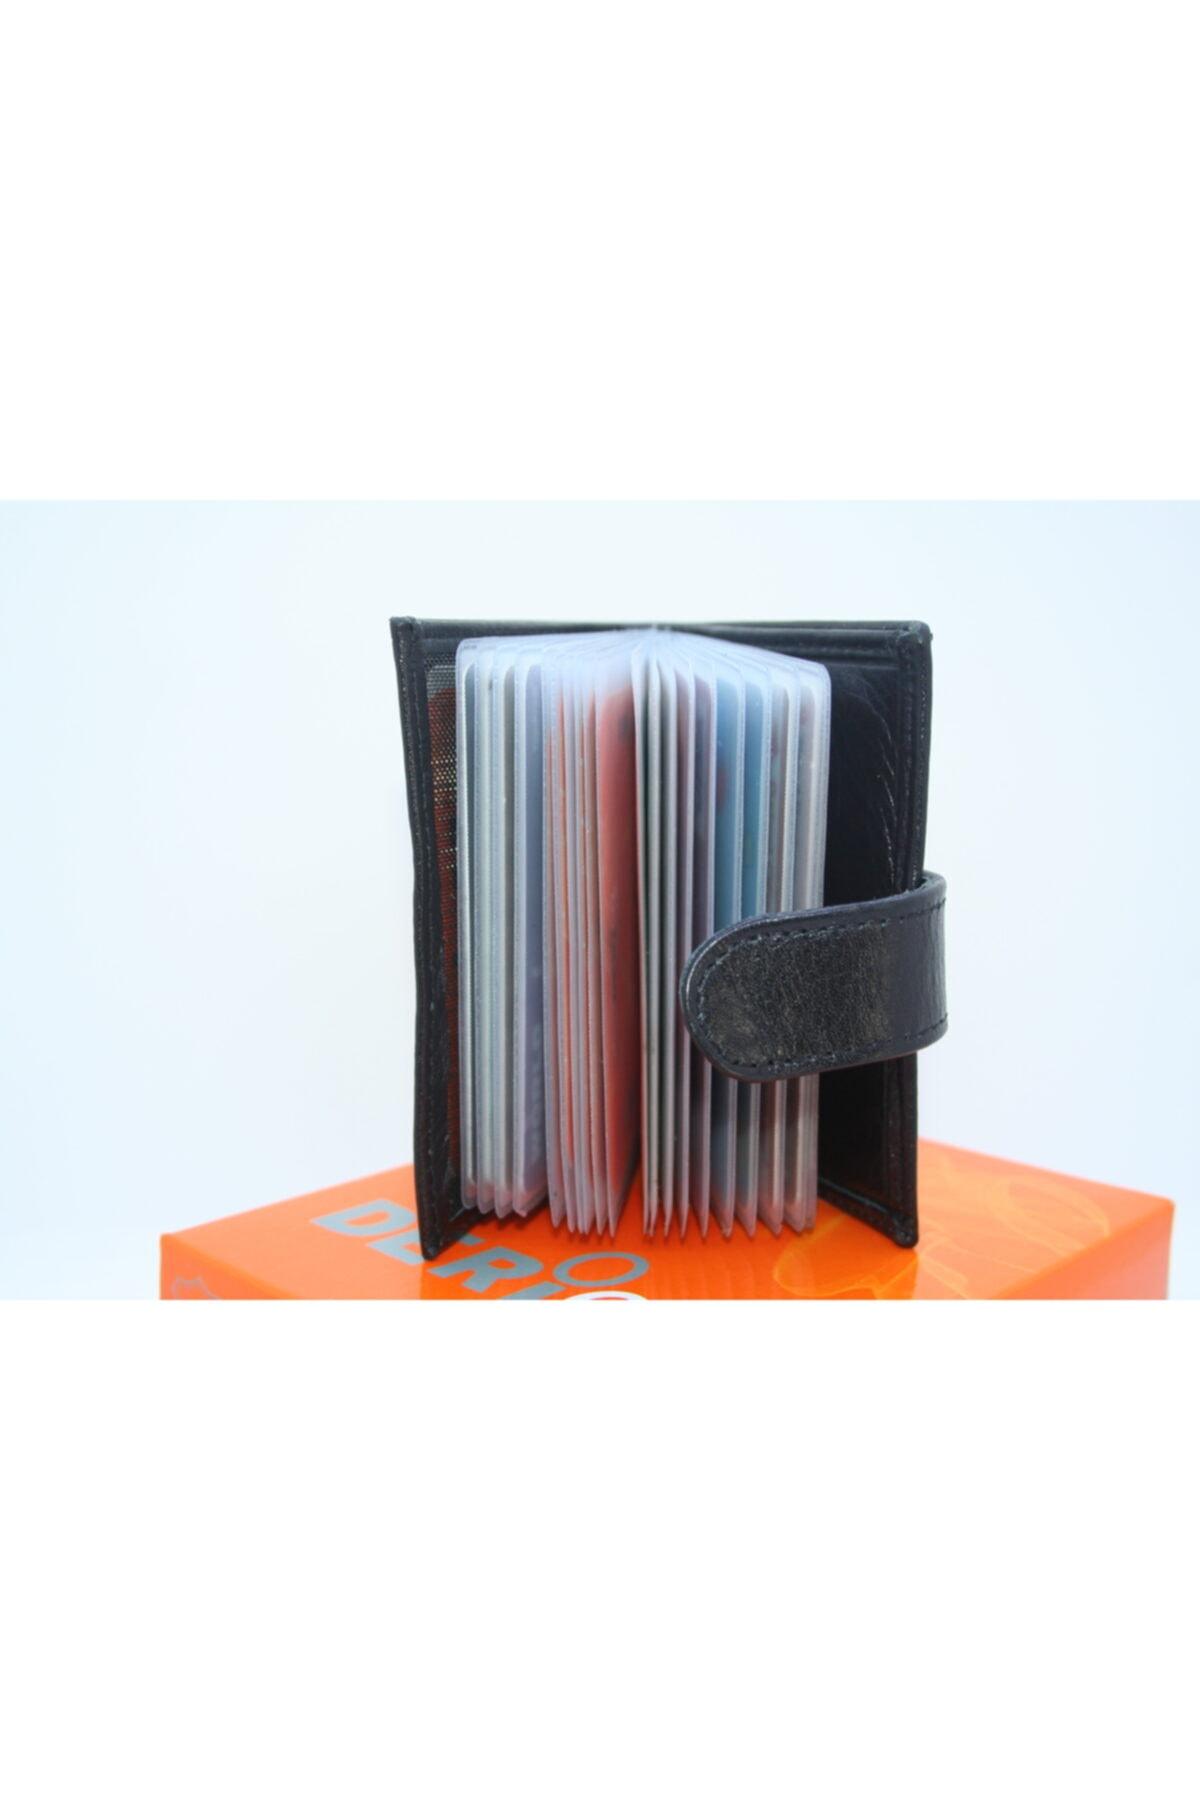 DERİCO Unisex Siyah Deri Kartlık 1